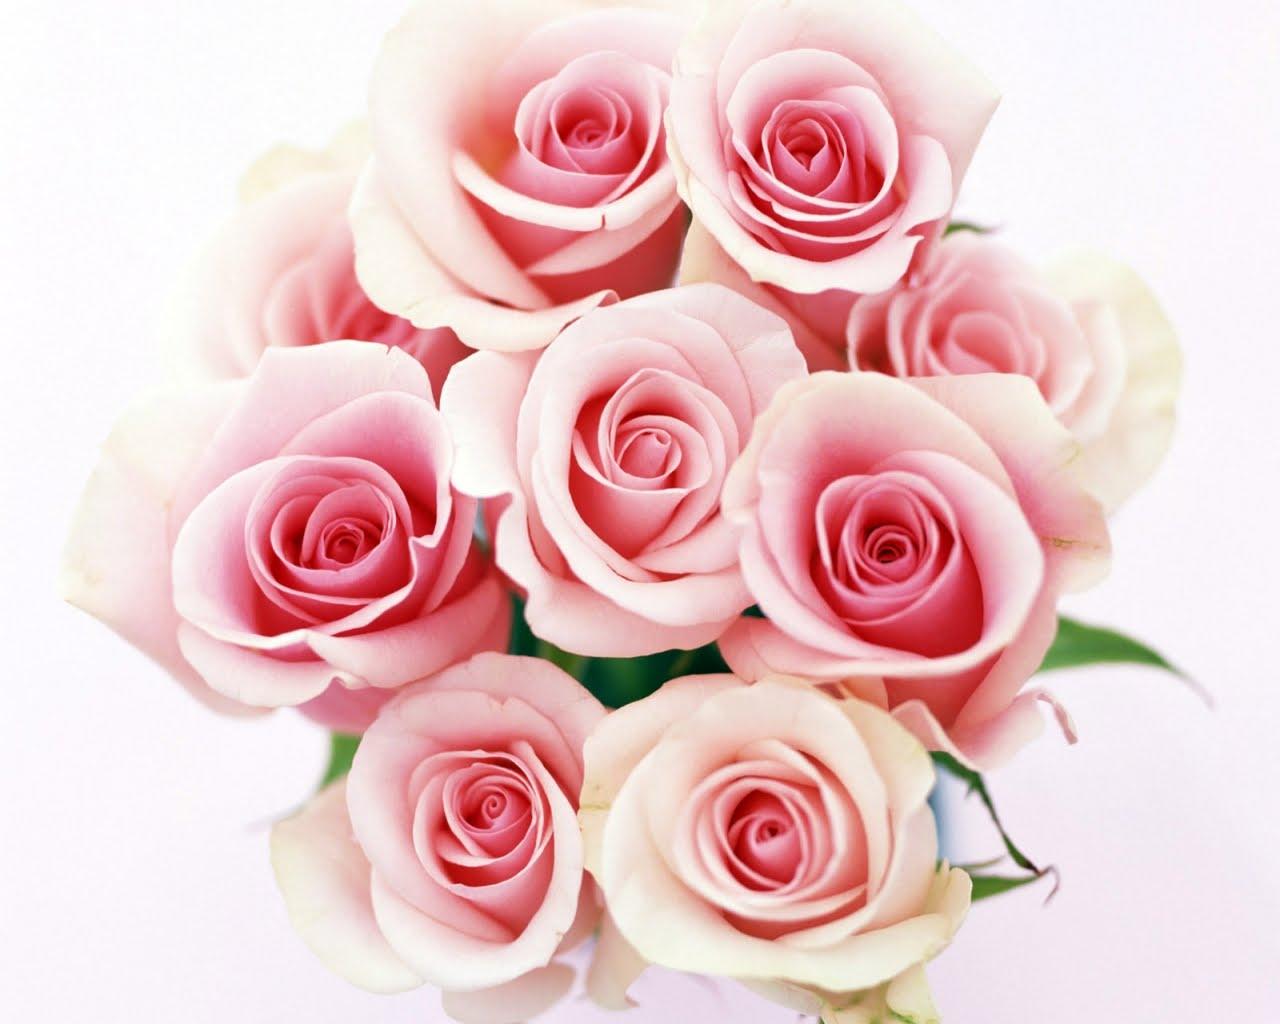 56. Gönülçelen -Inima furata - Heart Stealer - General Discussions - Comentarii - Pagina 4 Trandafiri_roze